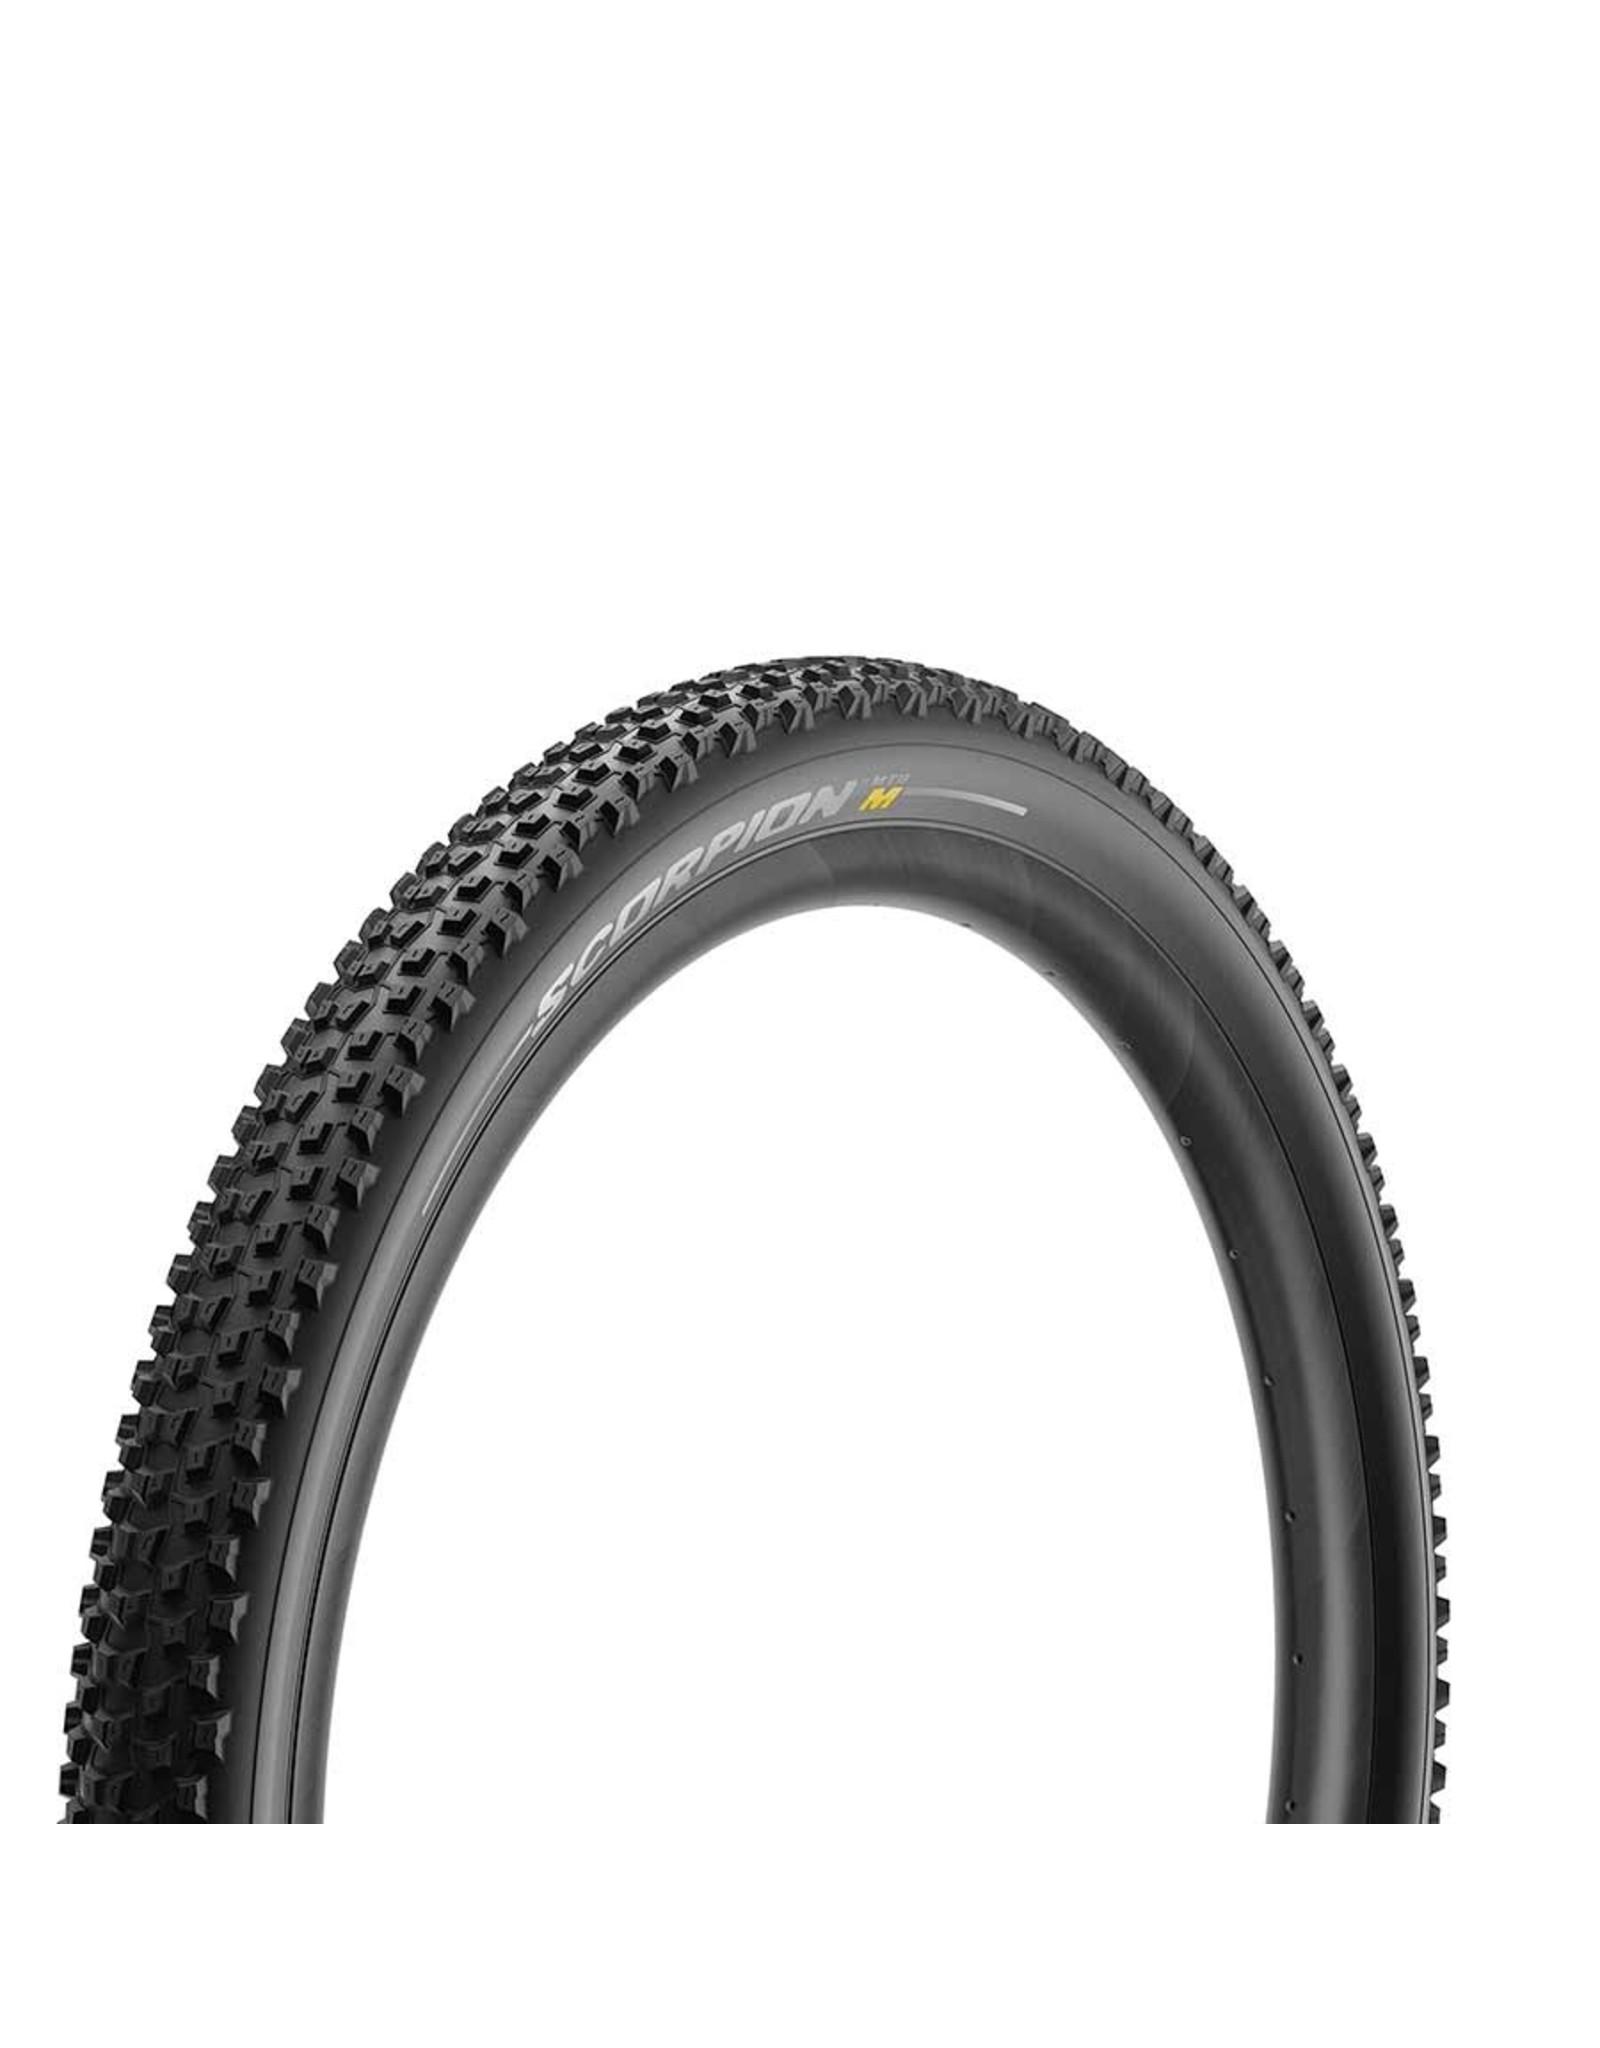 Pirelli Pirelli, Scorpion MTB M, Tire, 27.5''x2.60, Folding, Tubeless Ready, Smartgrip, Black